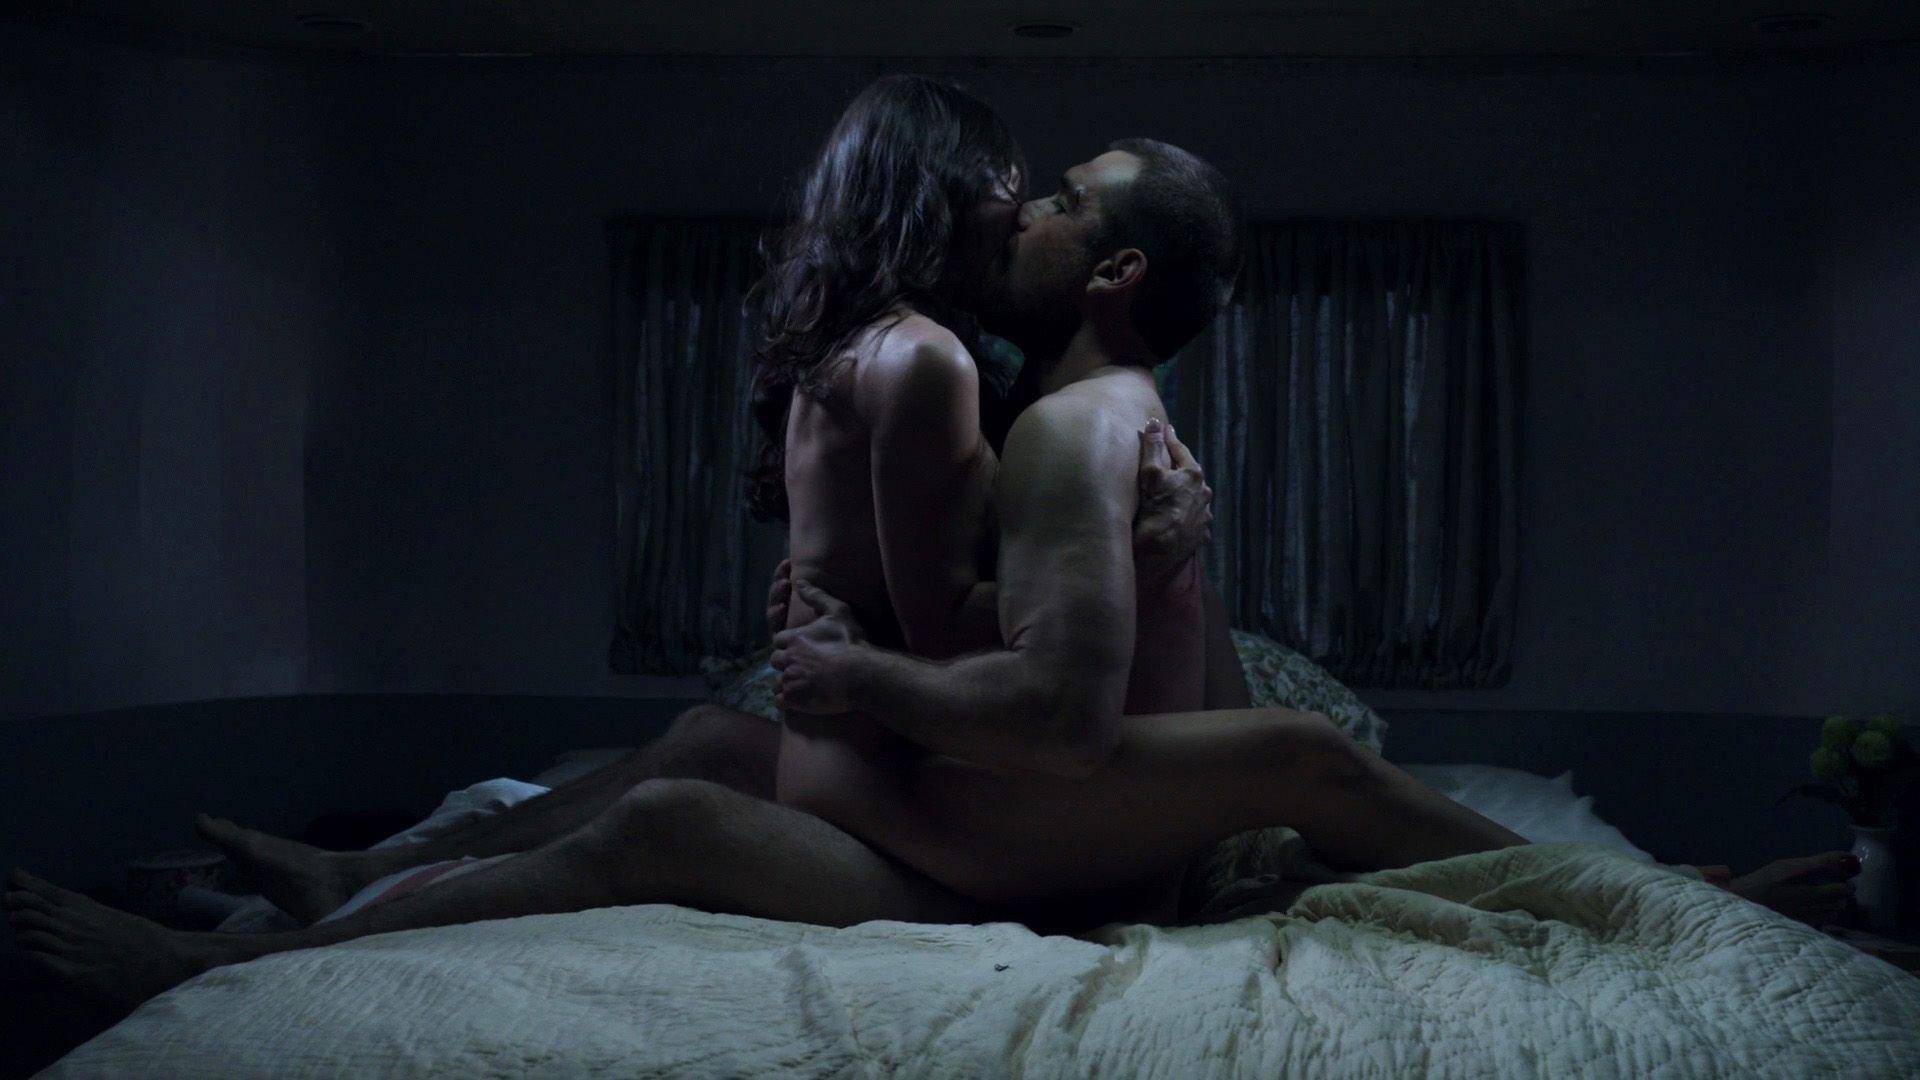 Banshee Sexy Porn - Trieste Kelly Dunn Nude – Banshee (6 Pics + GIF & Video ...